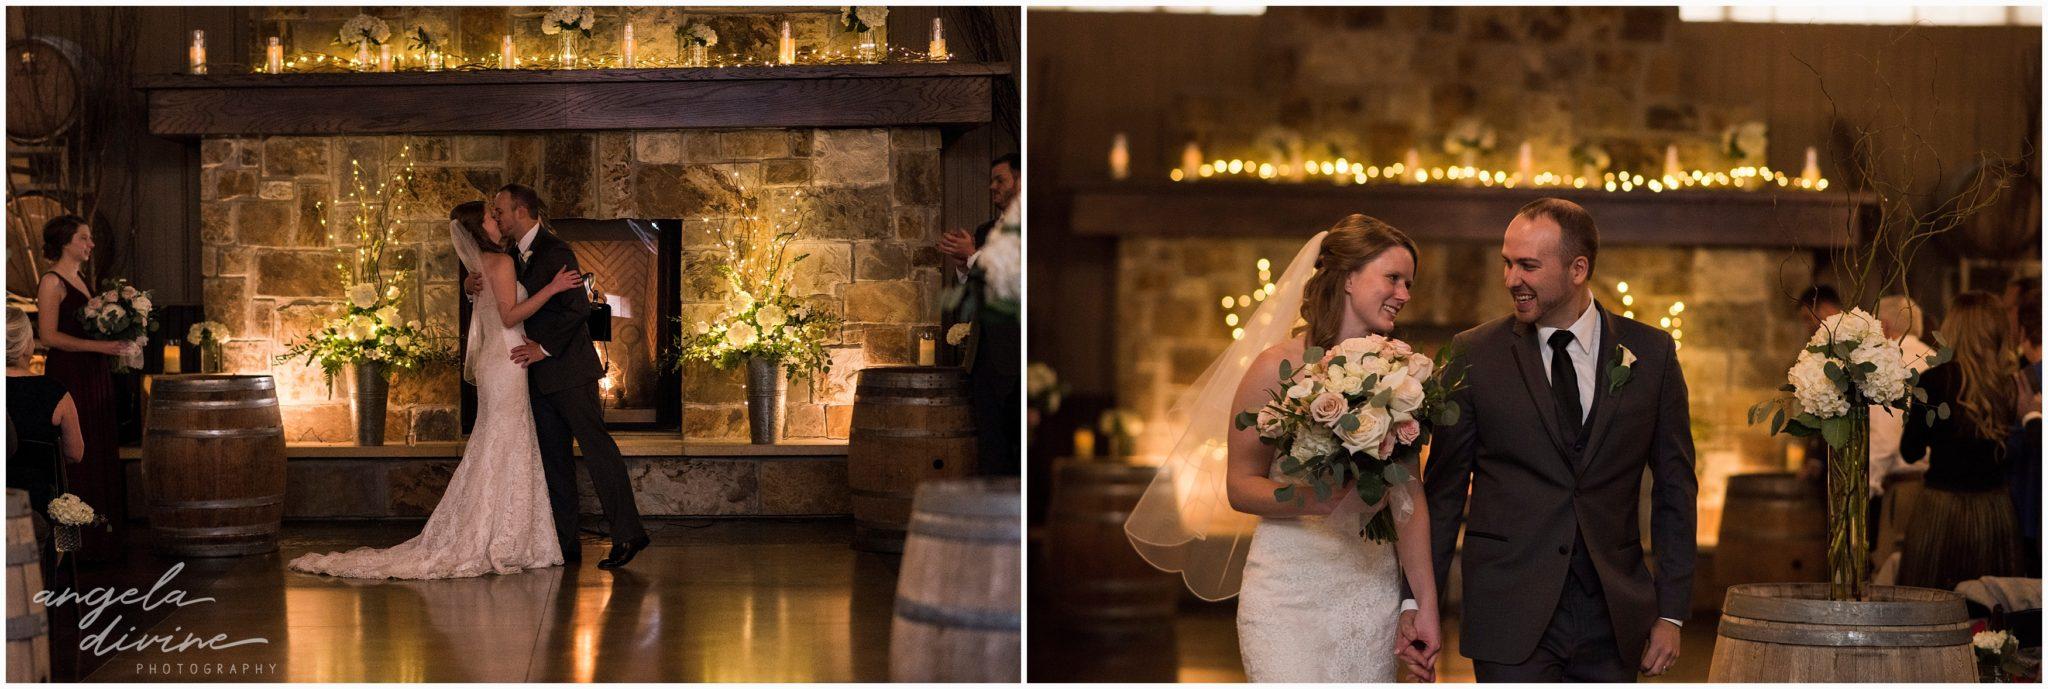 Carlos Creek Winery Wedding Ceremony End